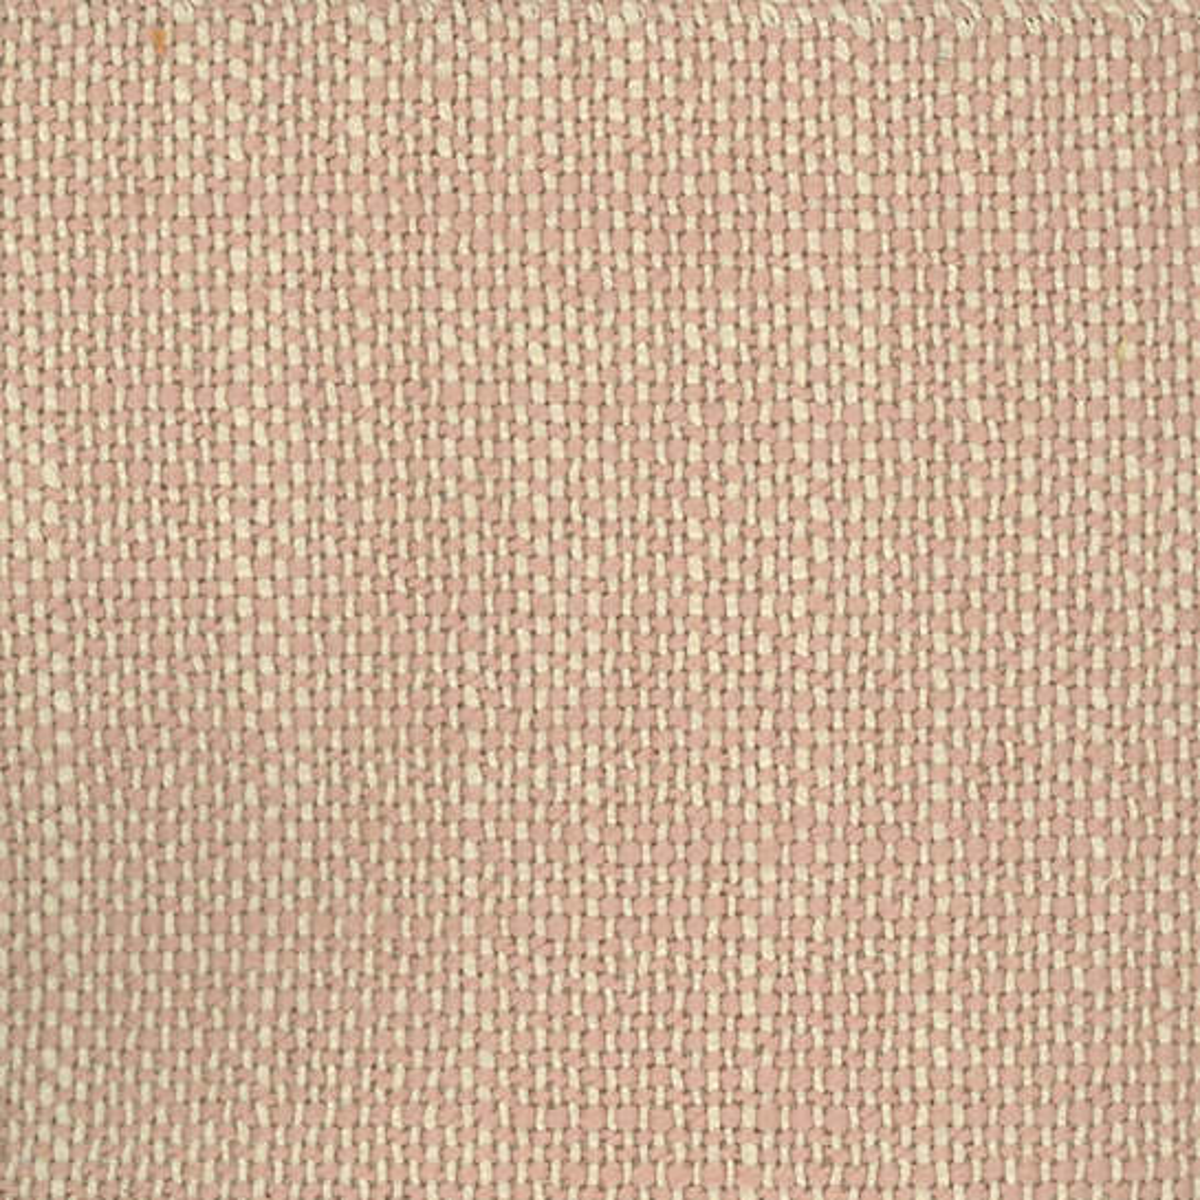 Slipper Pink Lausanne Fabric